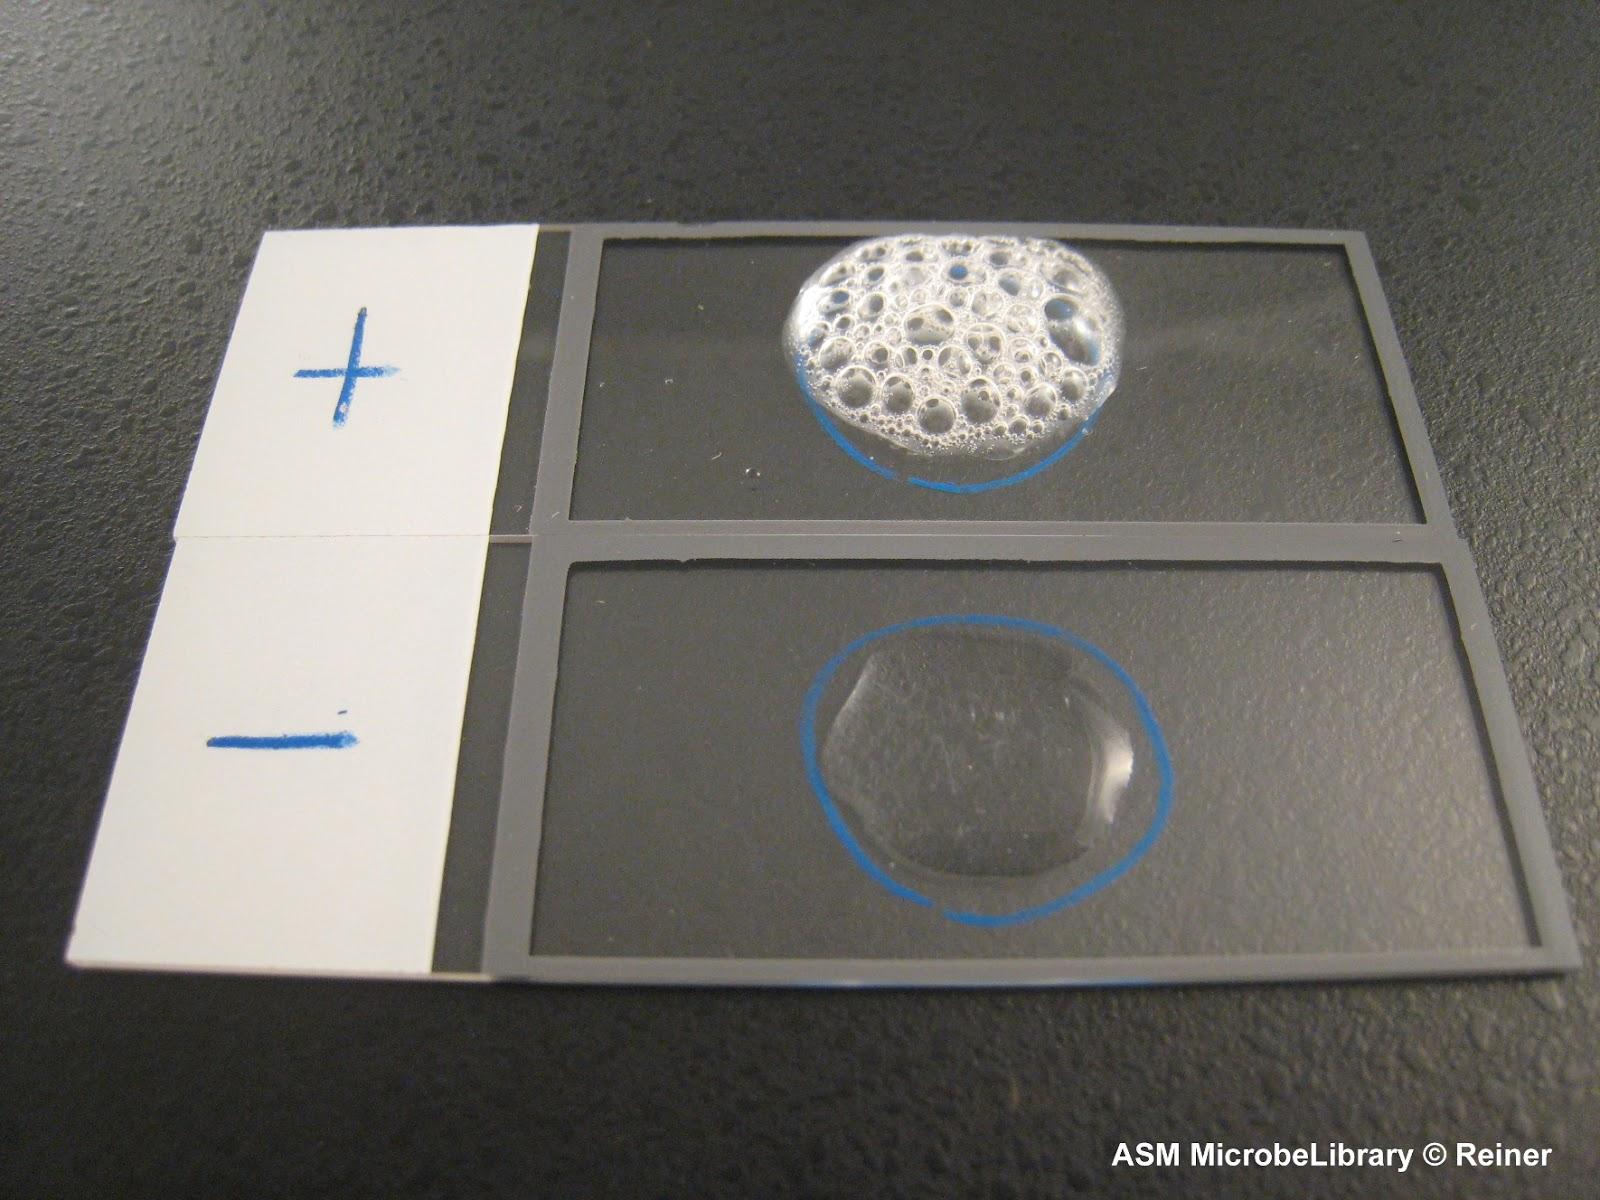 Staphylococcus aureus catalase test